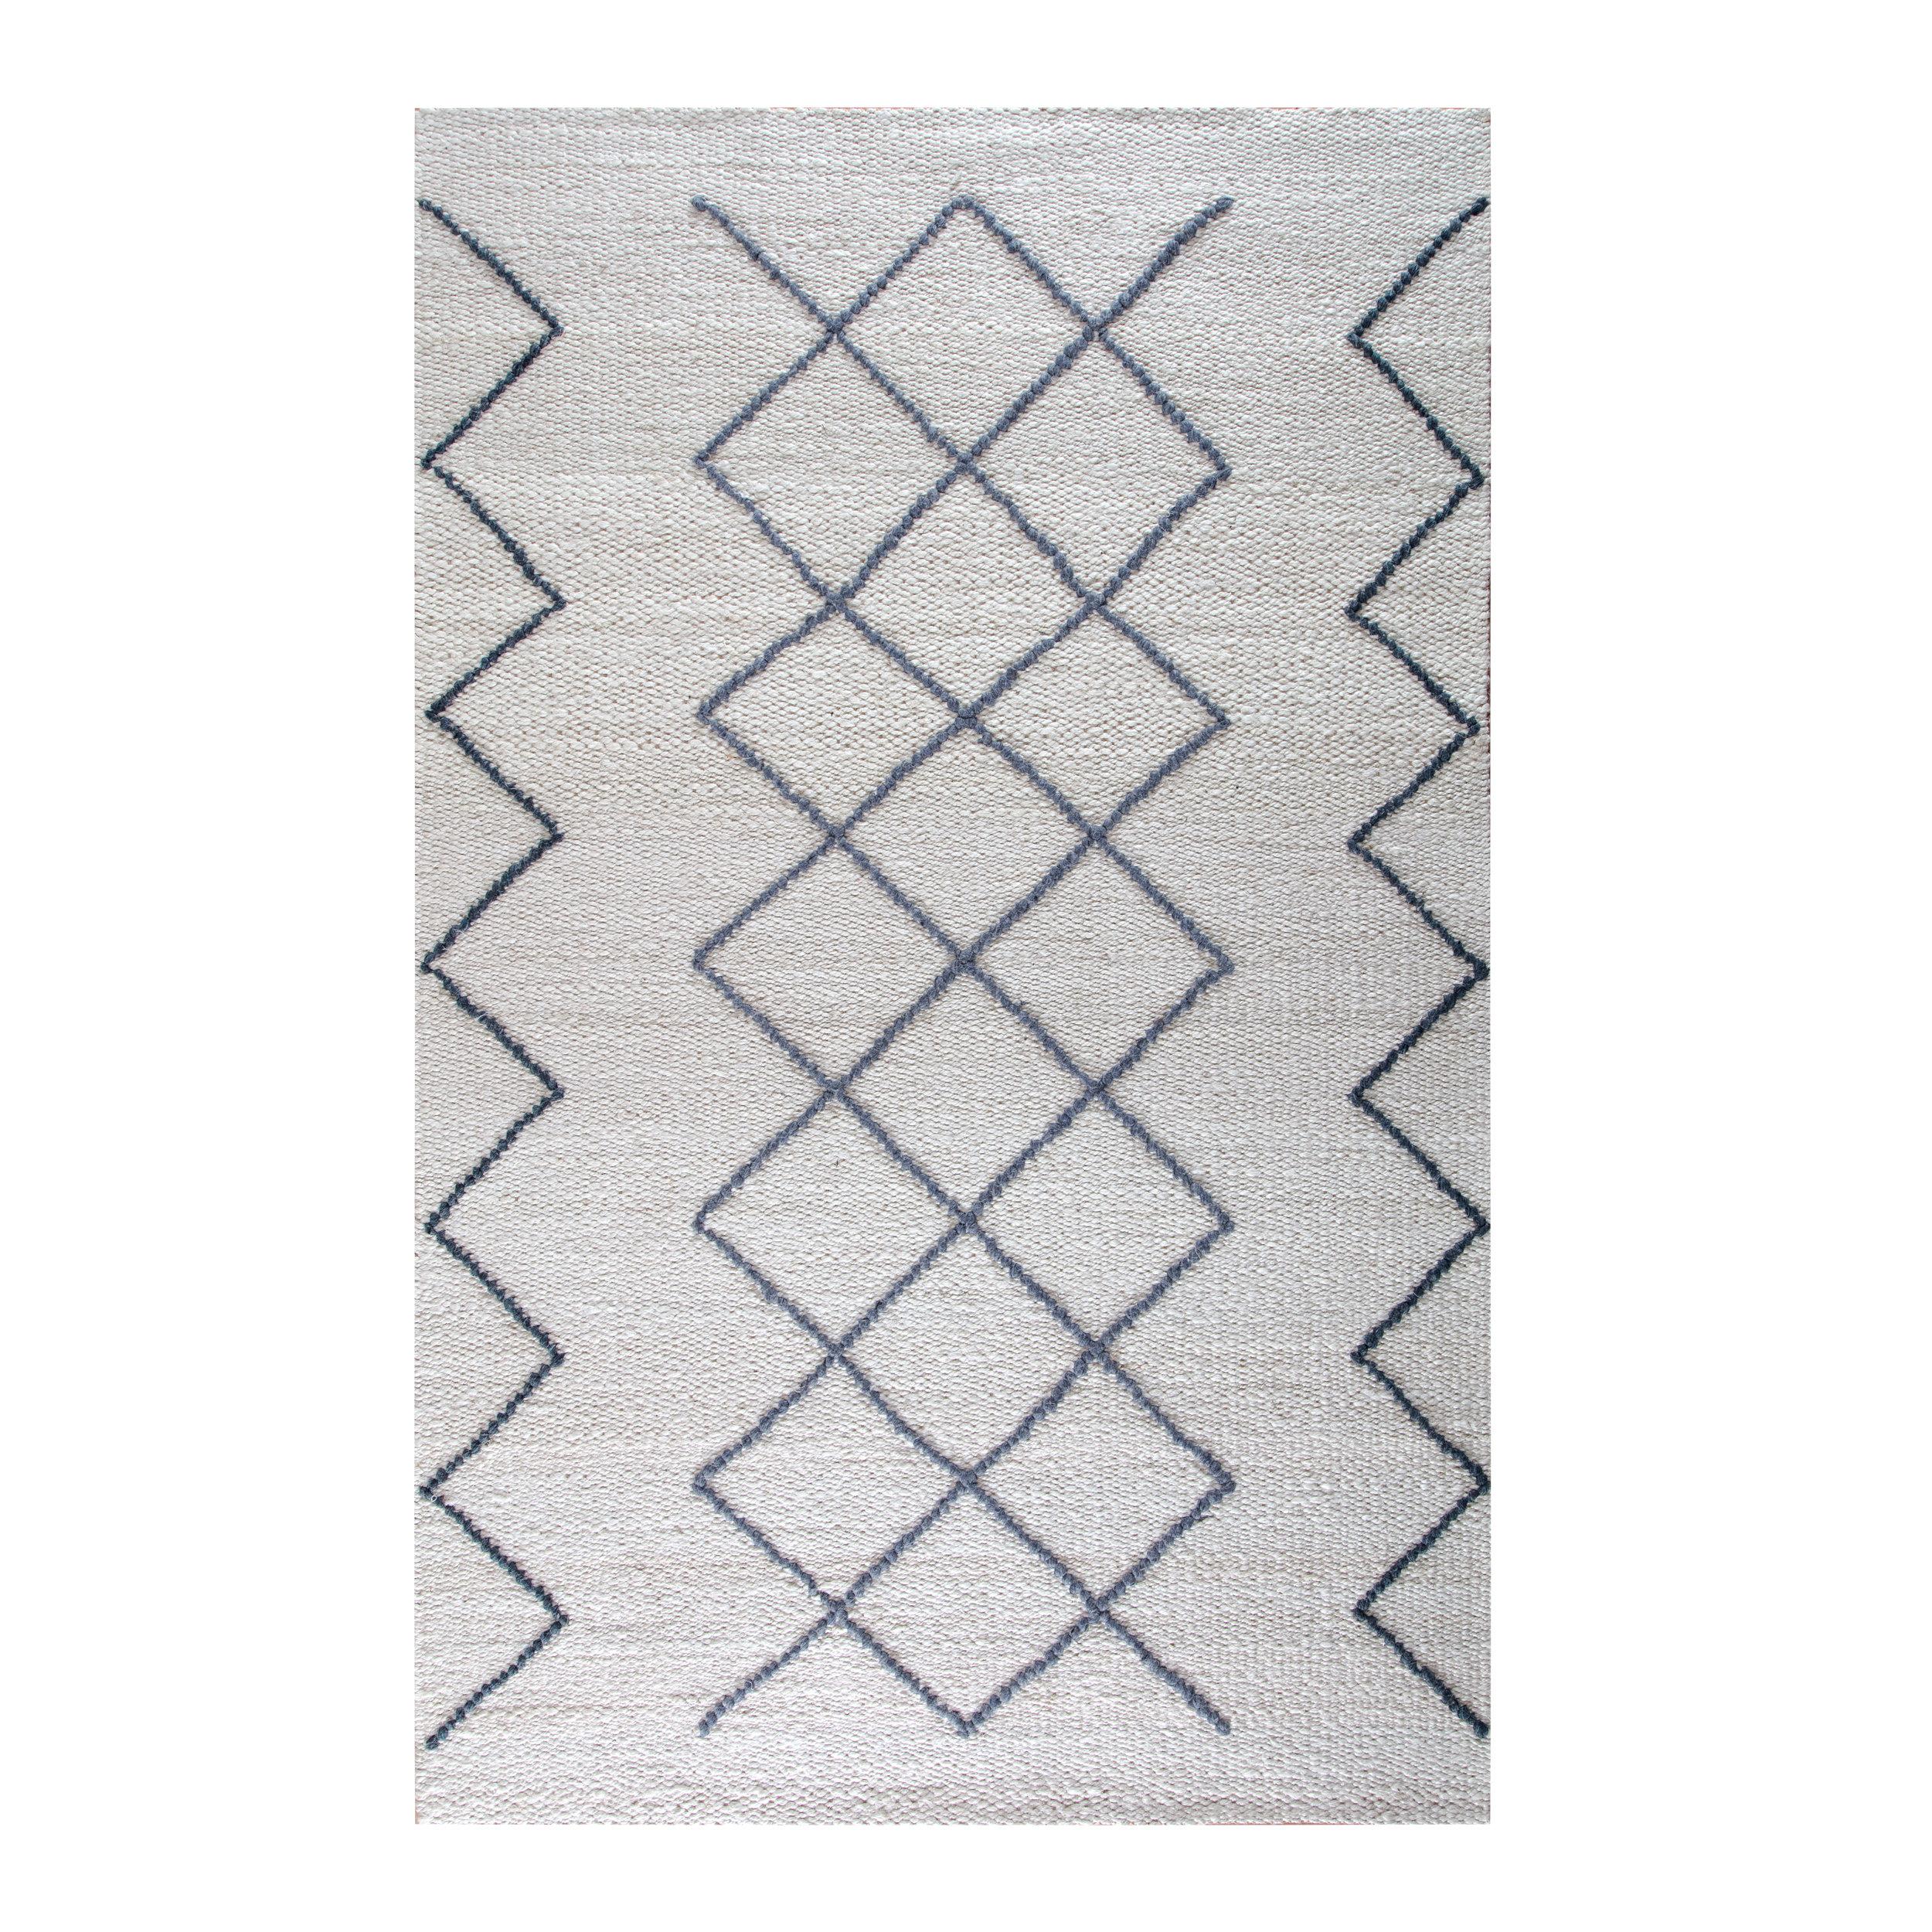 Antoinette Geometric Handmade Flatweave Jute Wool Gray Blue Ivory Area Rug Allmodern